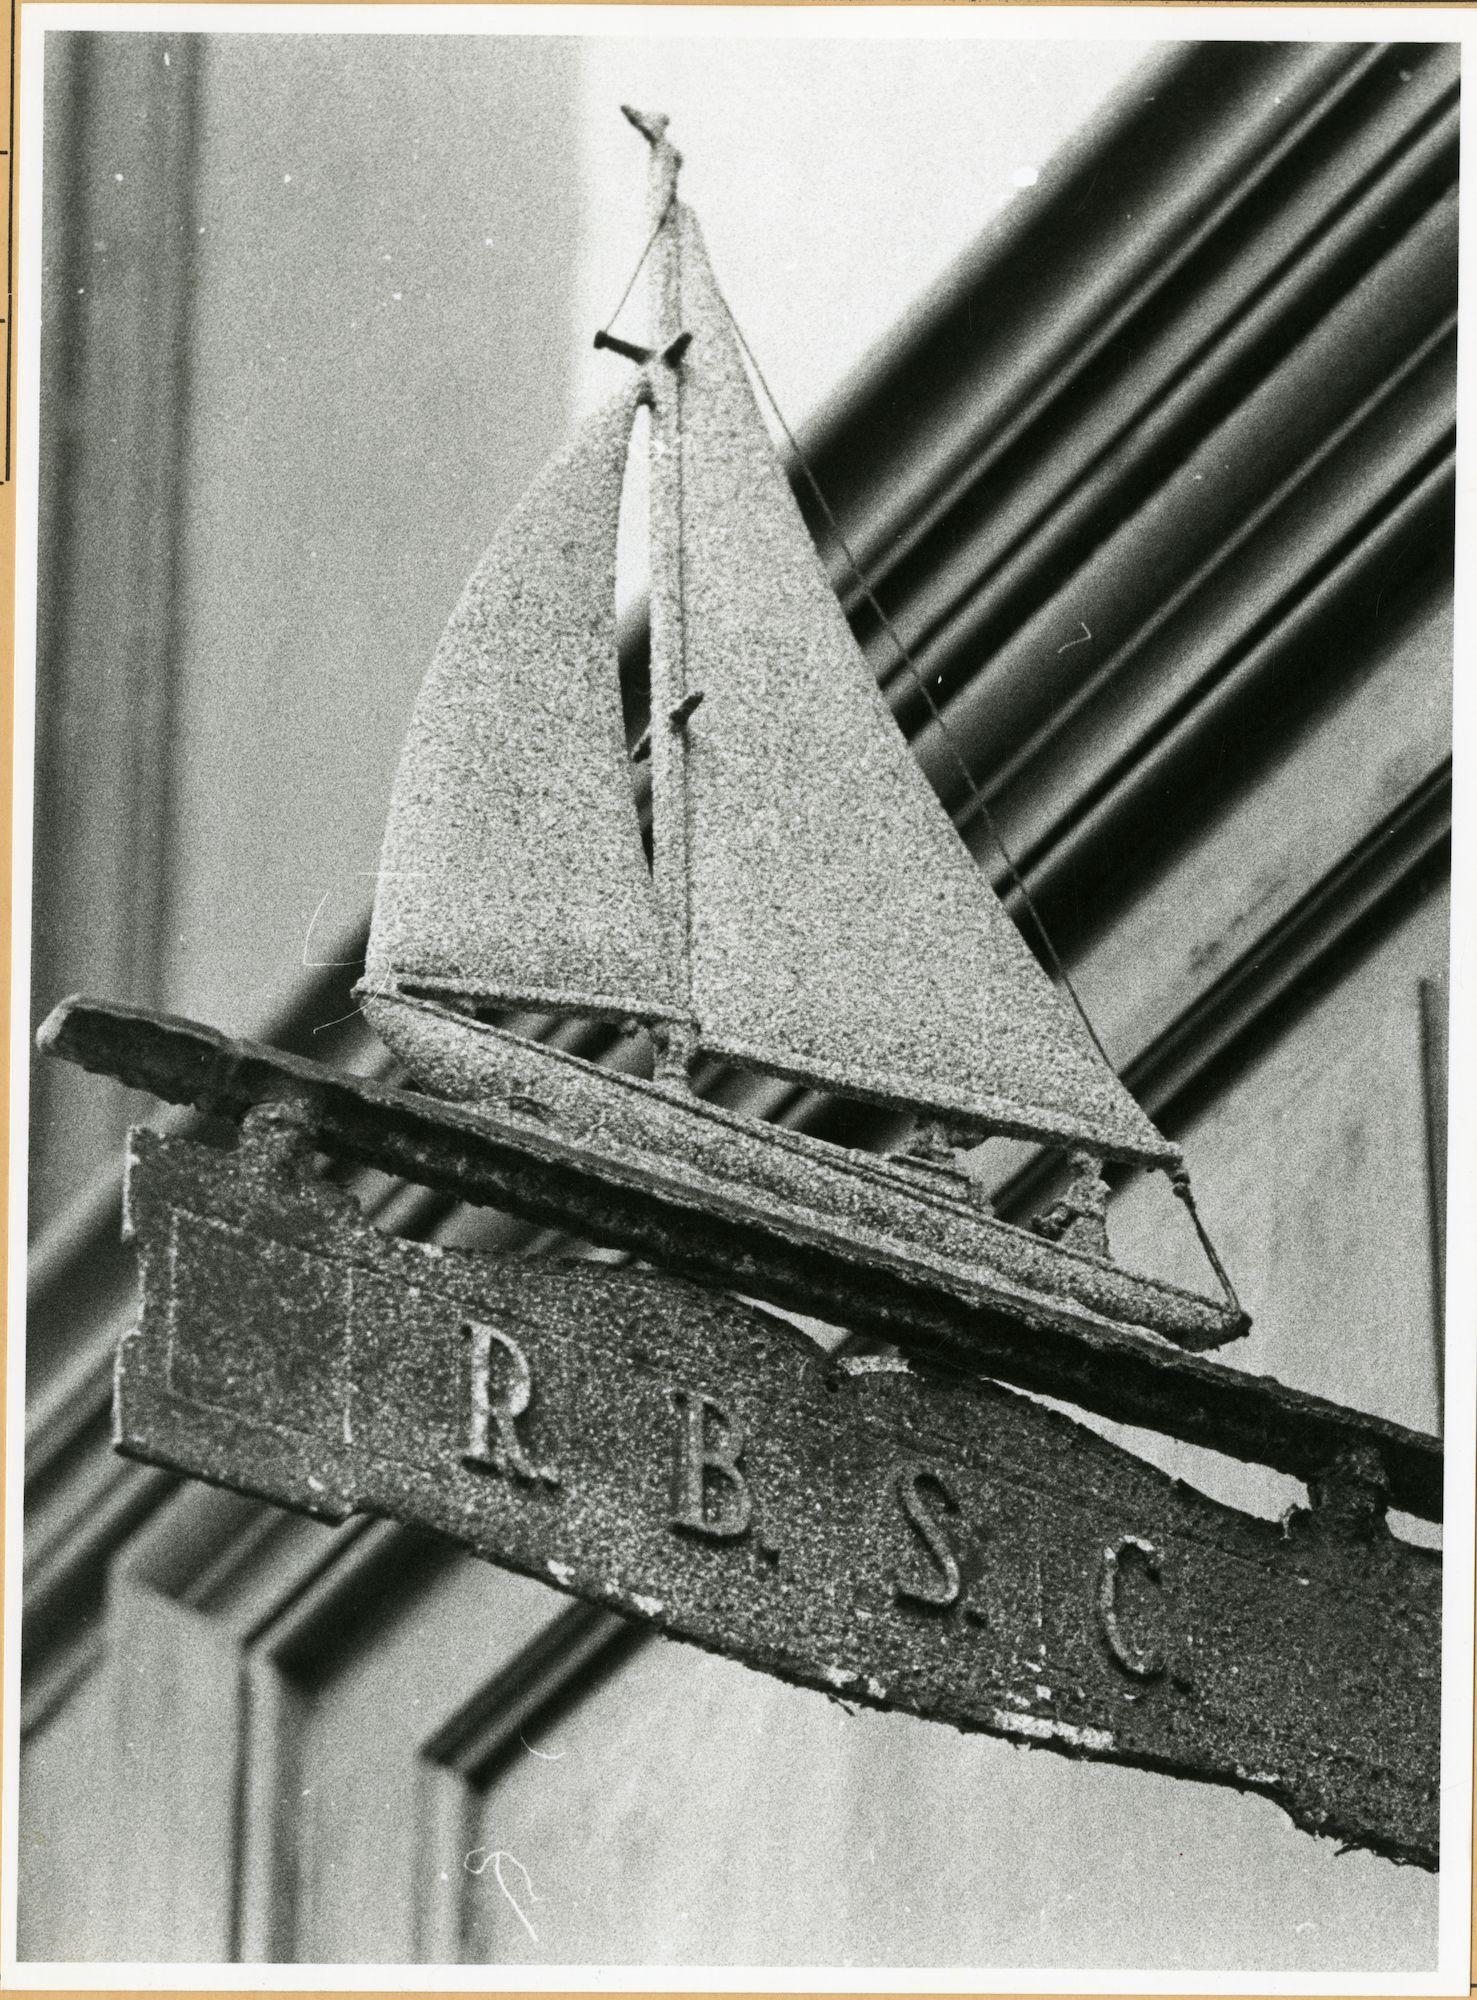 Gent: Drabstraat 12A: uithangbord: R.B.S.C.